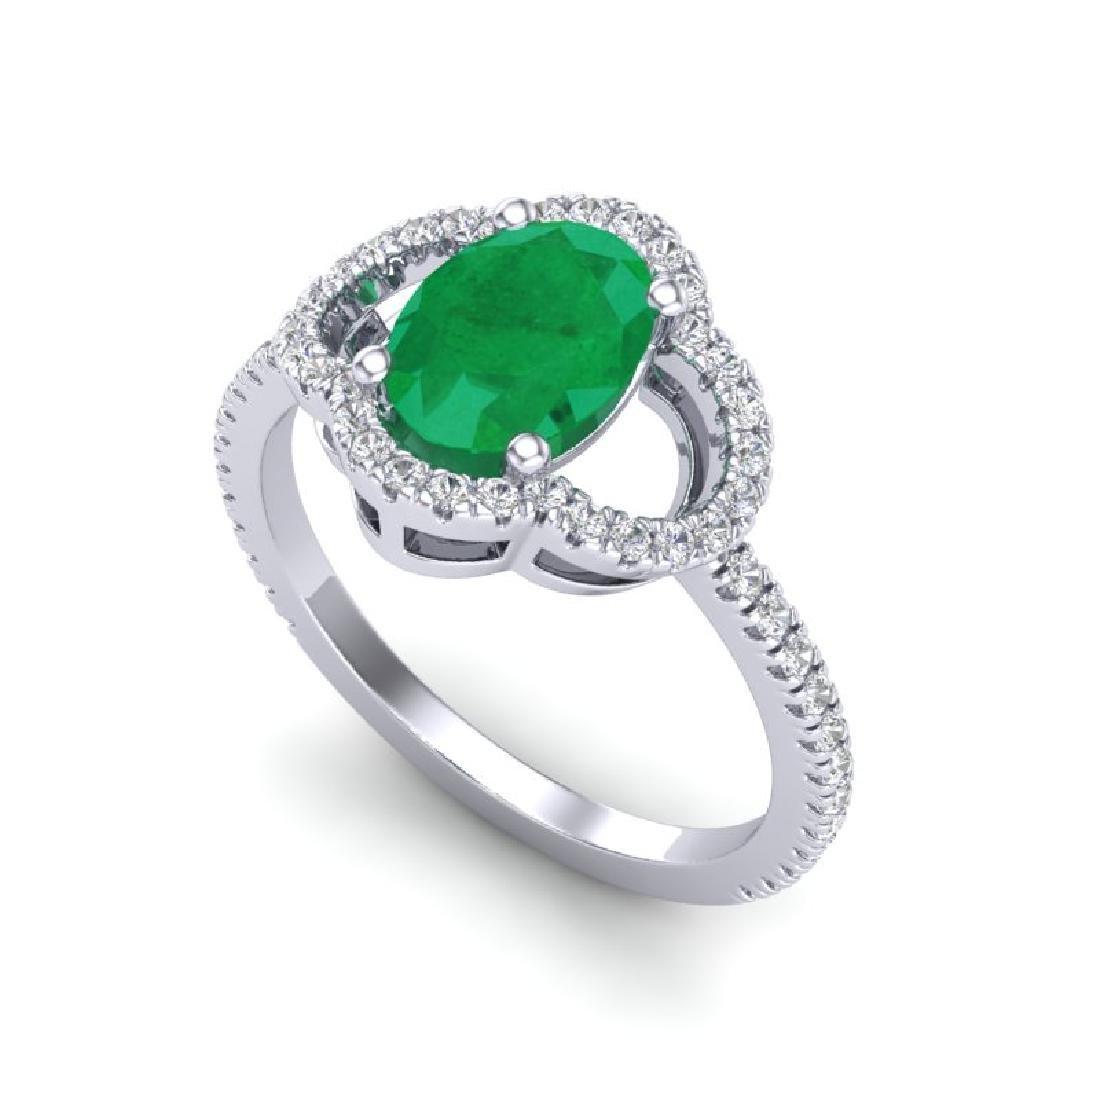 2 CTW Emerald & Micro Pave VS/SI Diamond Ring 10K White - 2